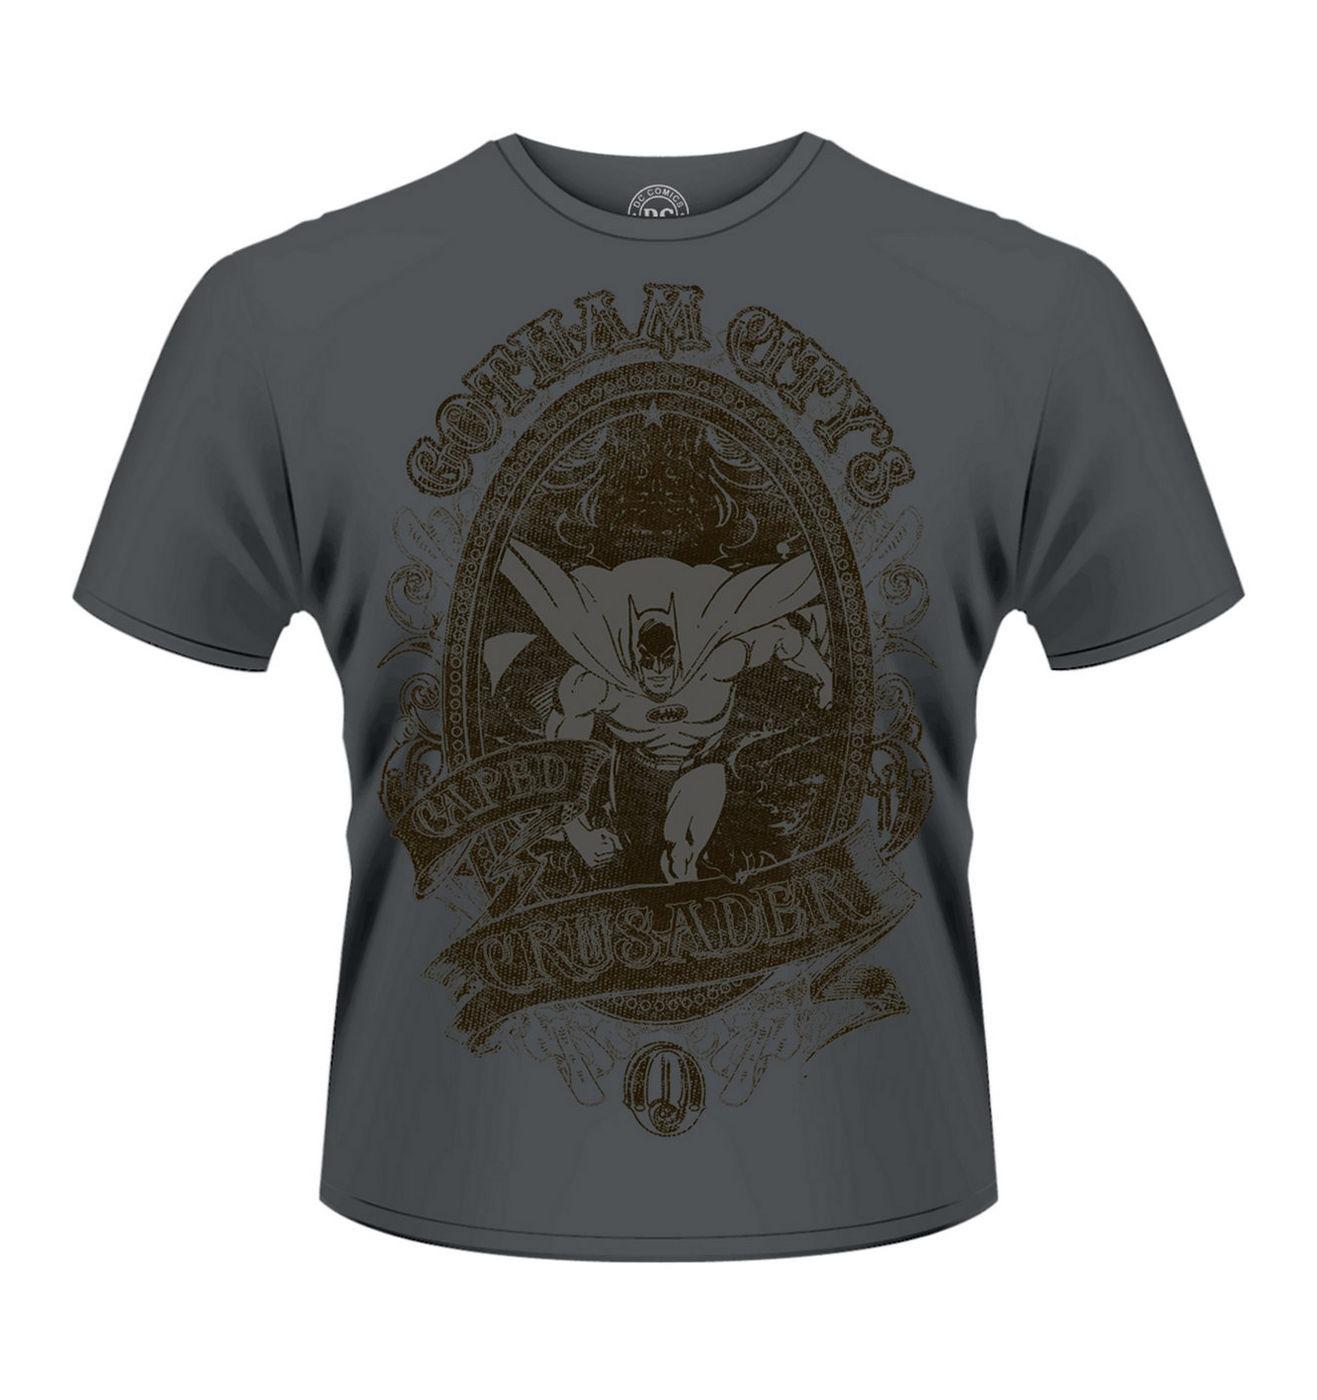 OFFICIAL Batman Gotham City men's t-shirt